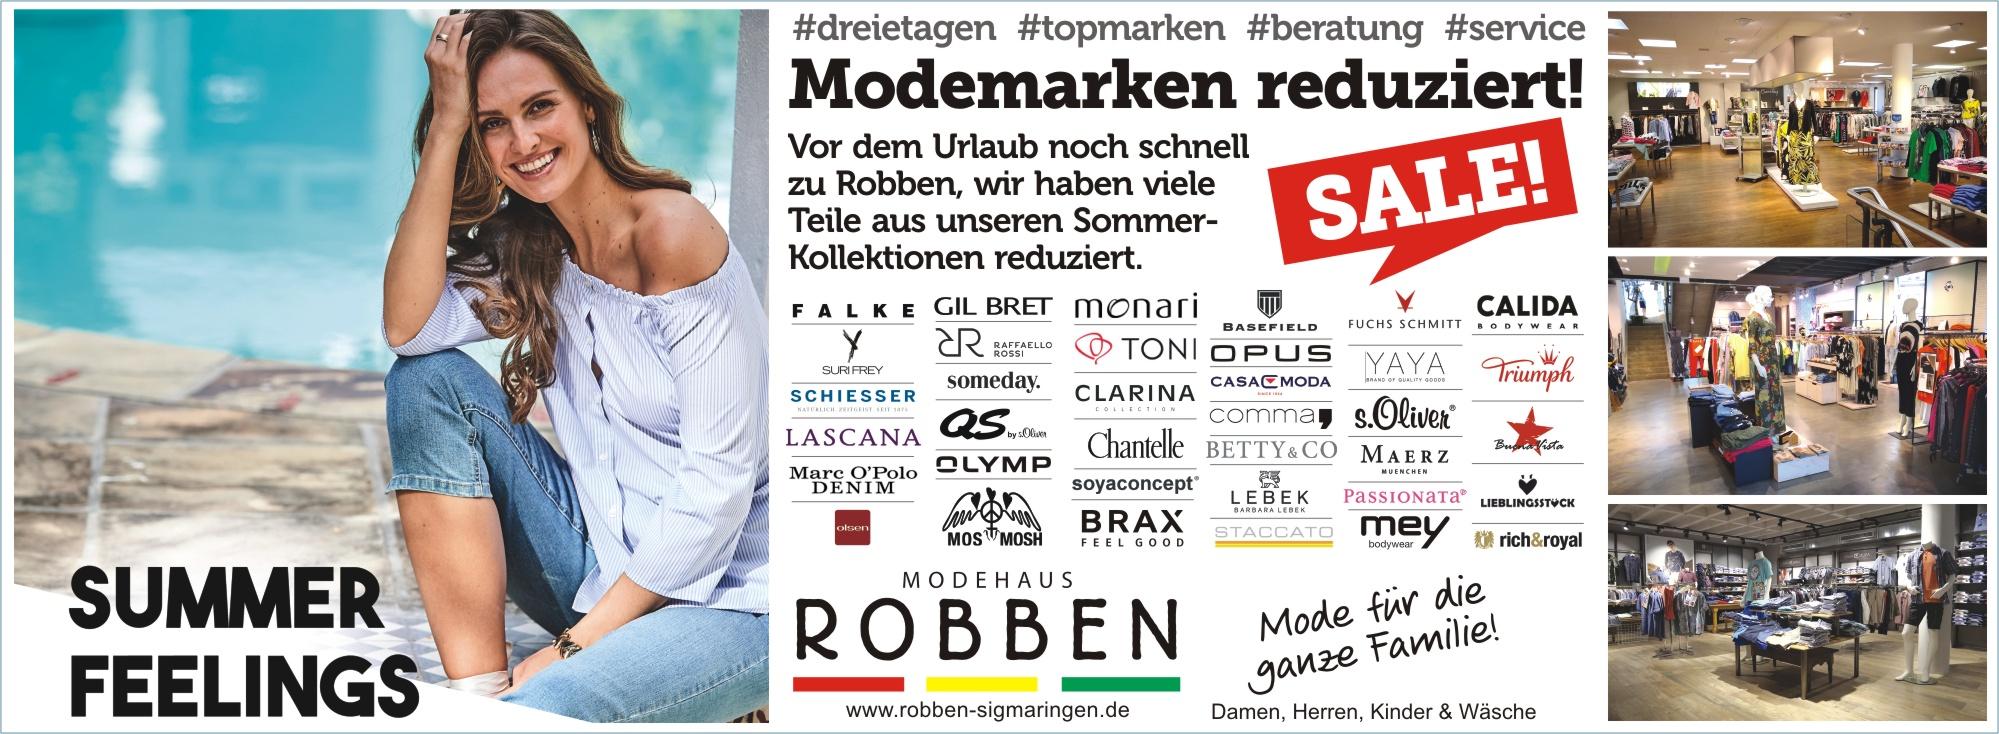 modehaus-robben